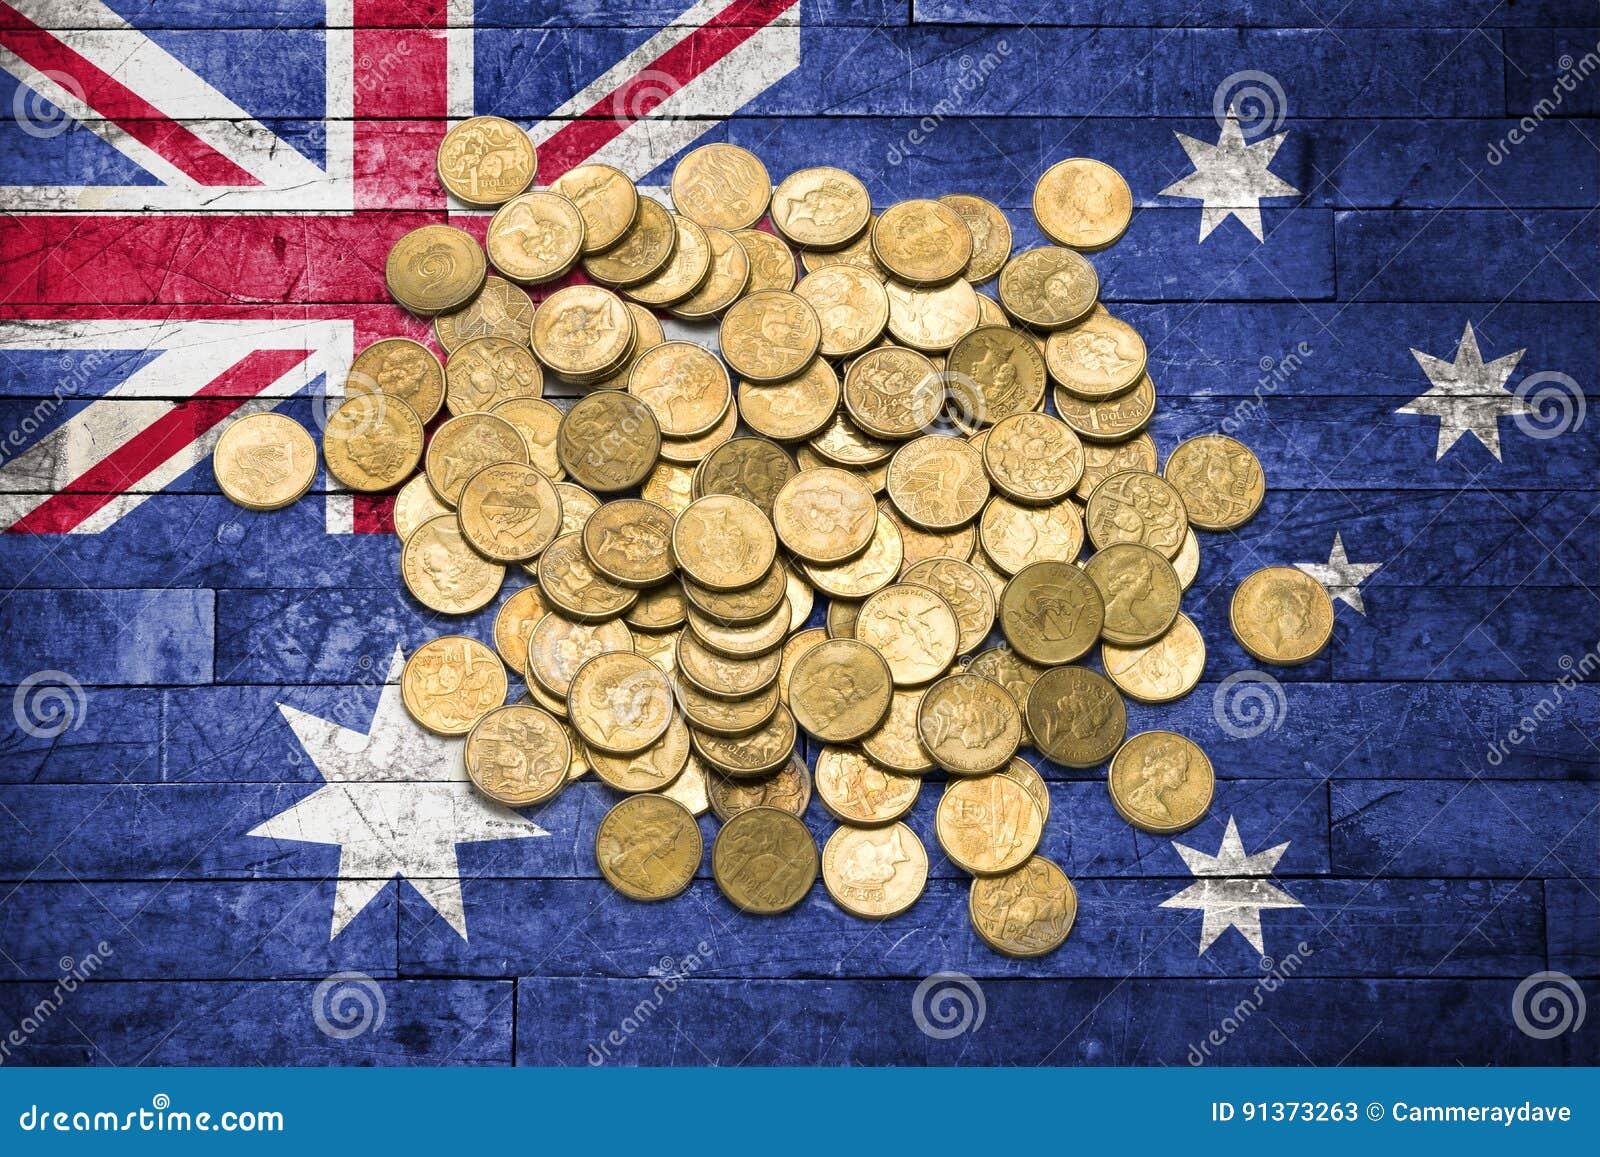 Money Australian Flag Business Coins